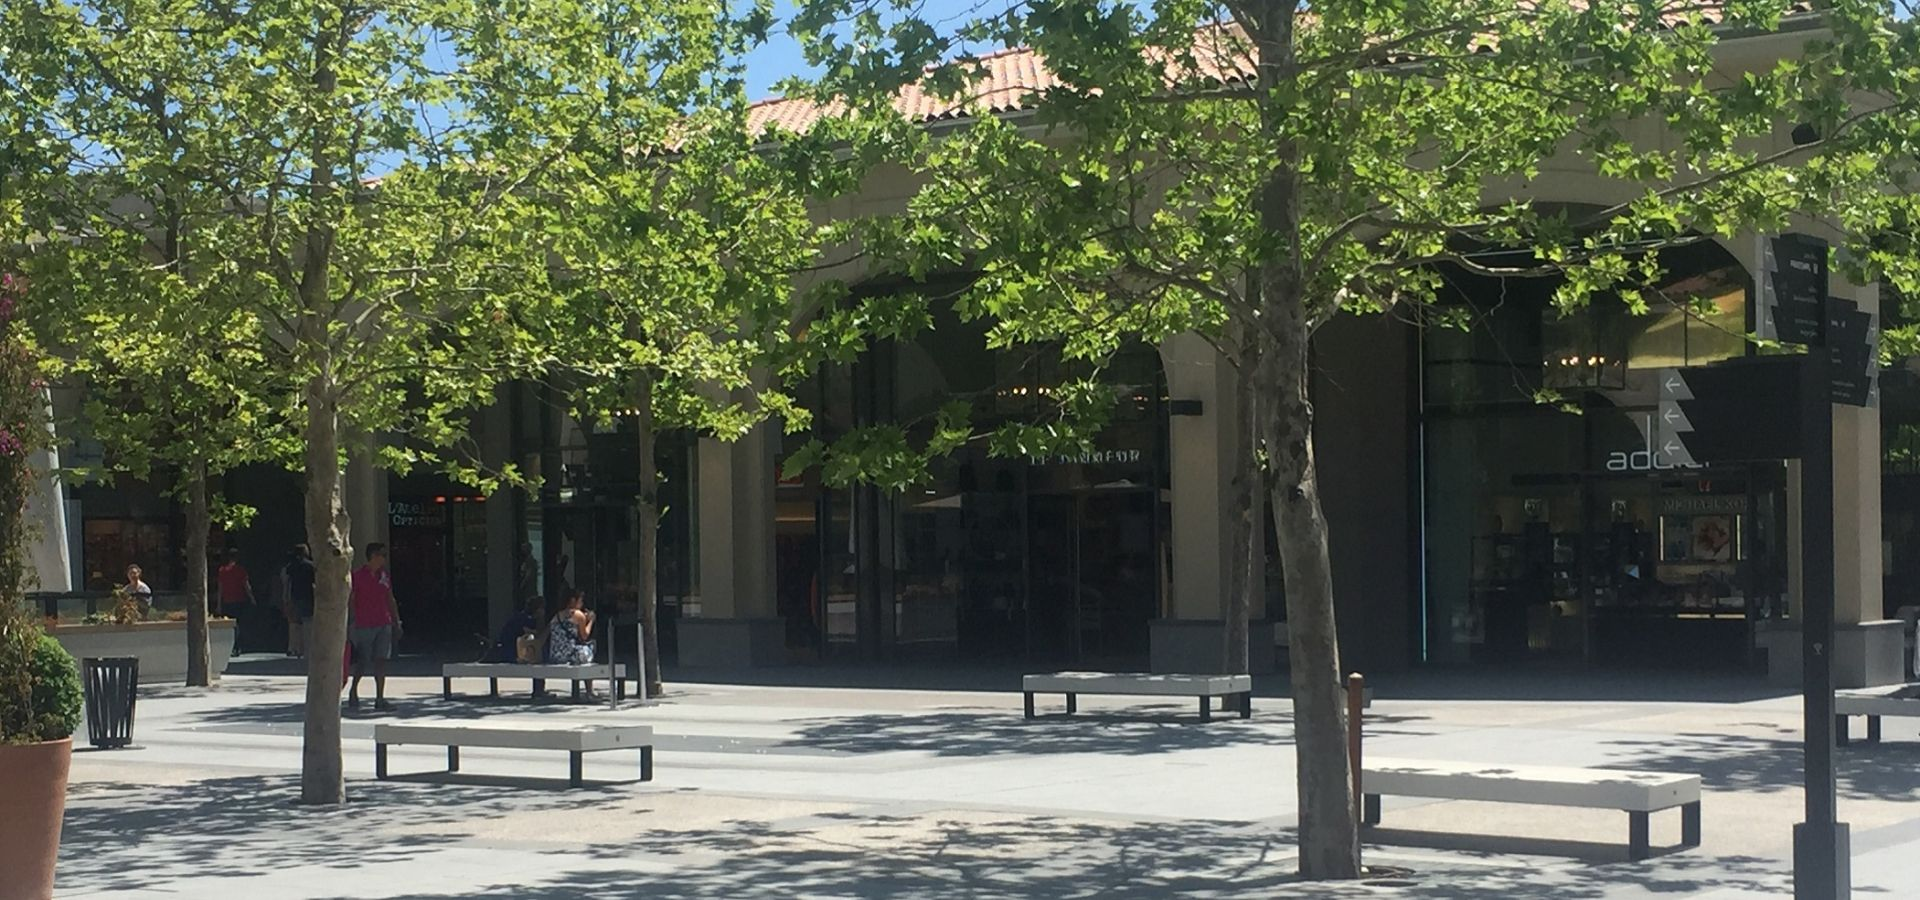 banc Metalco DIAMANTE et GIADA Centre commercial Cagnes Riviera